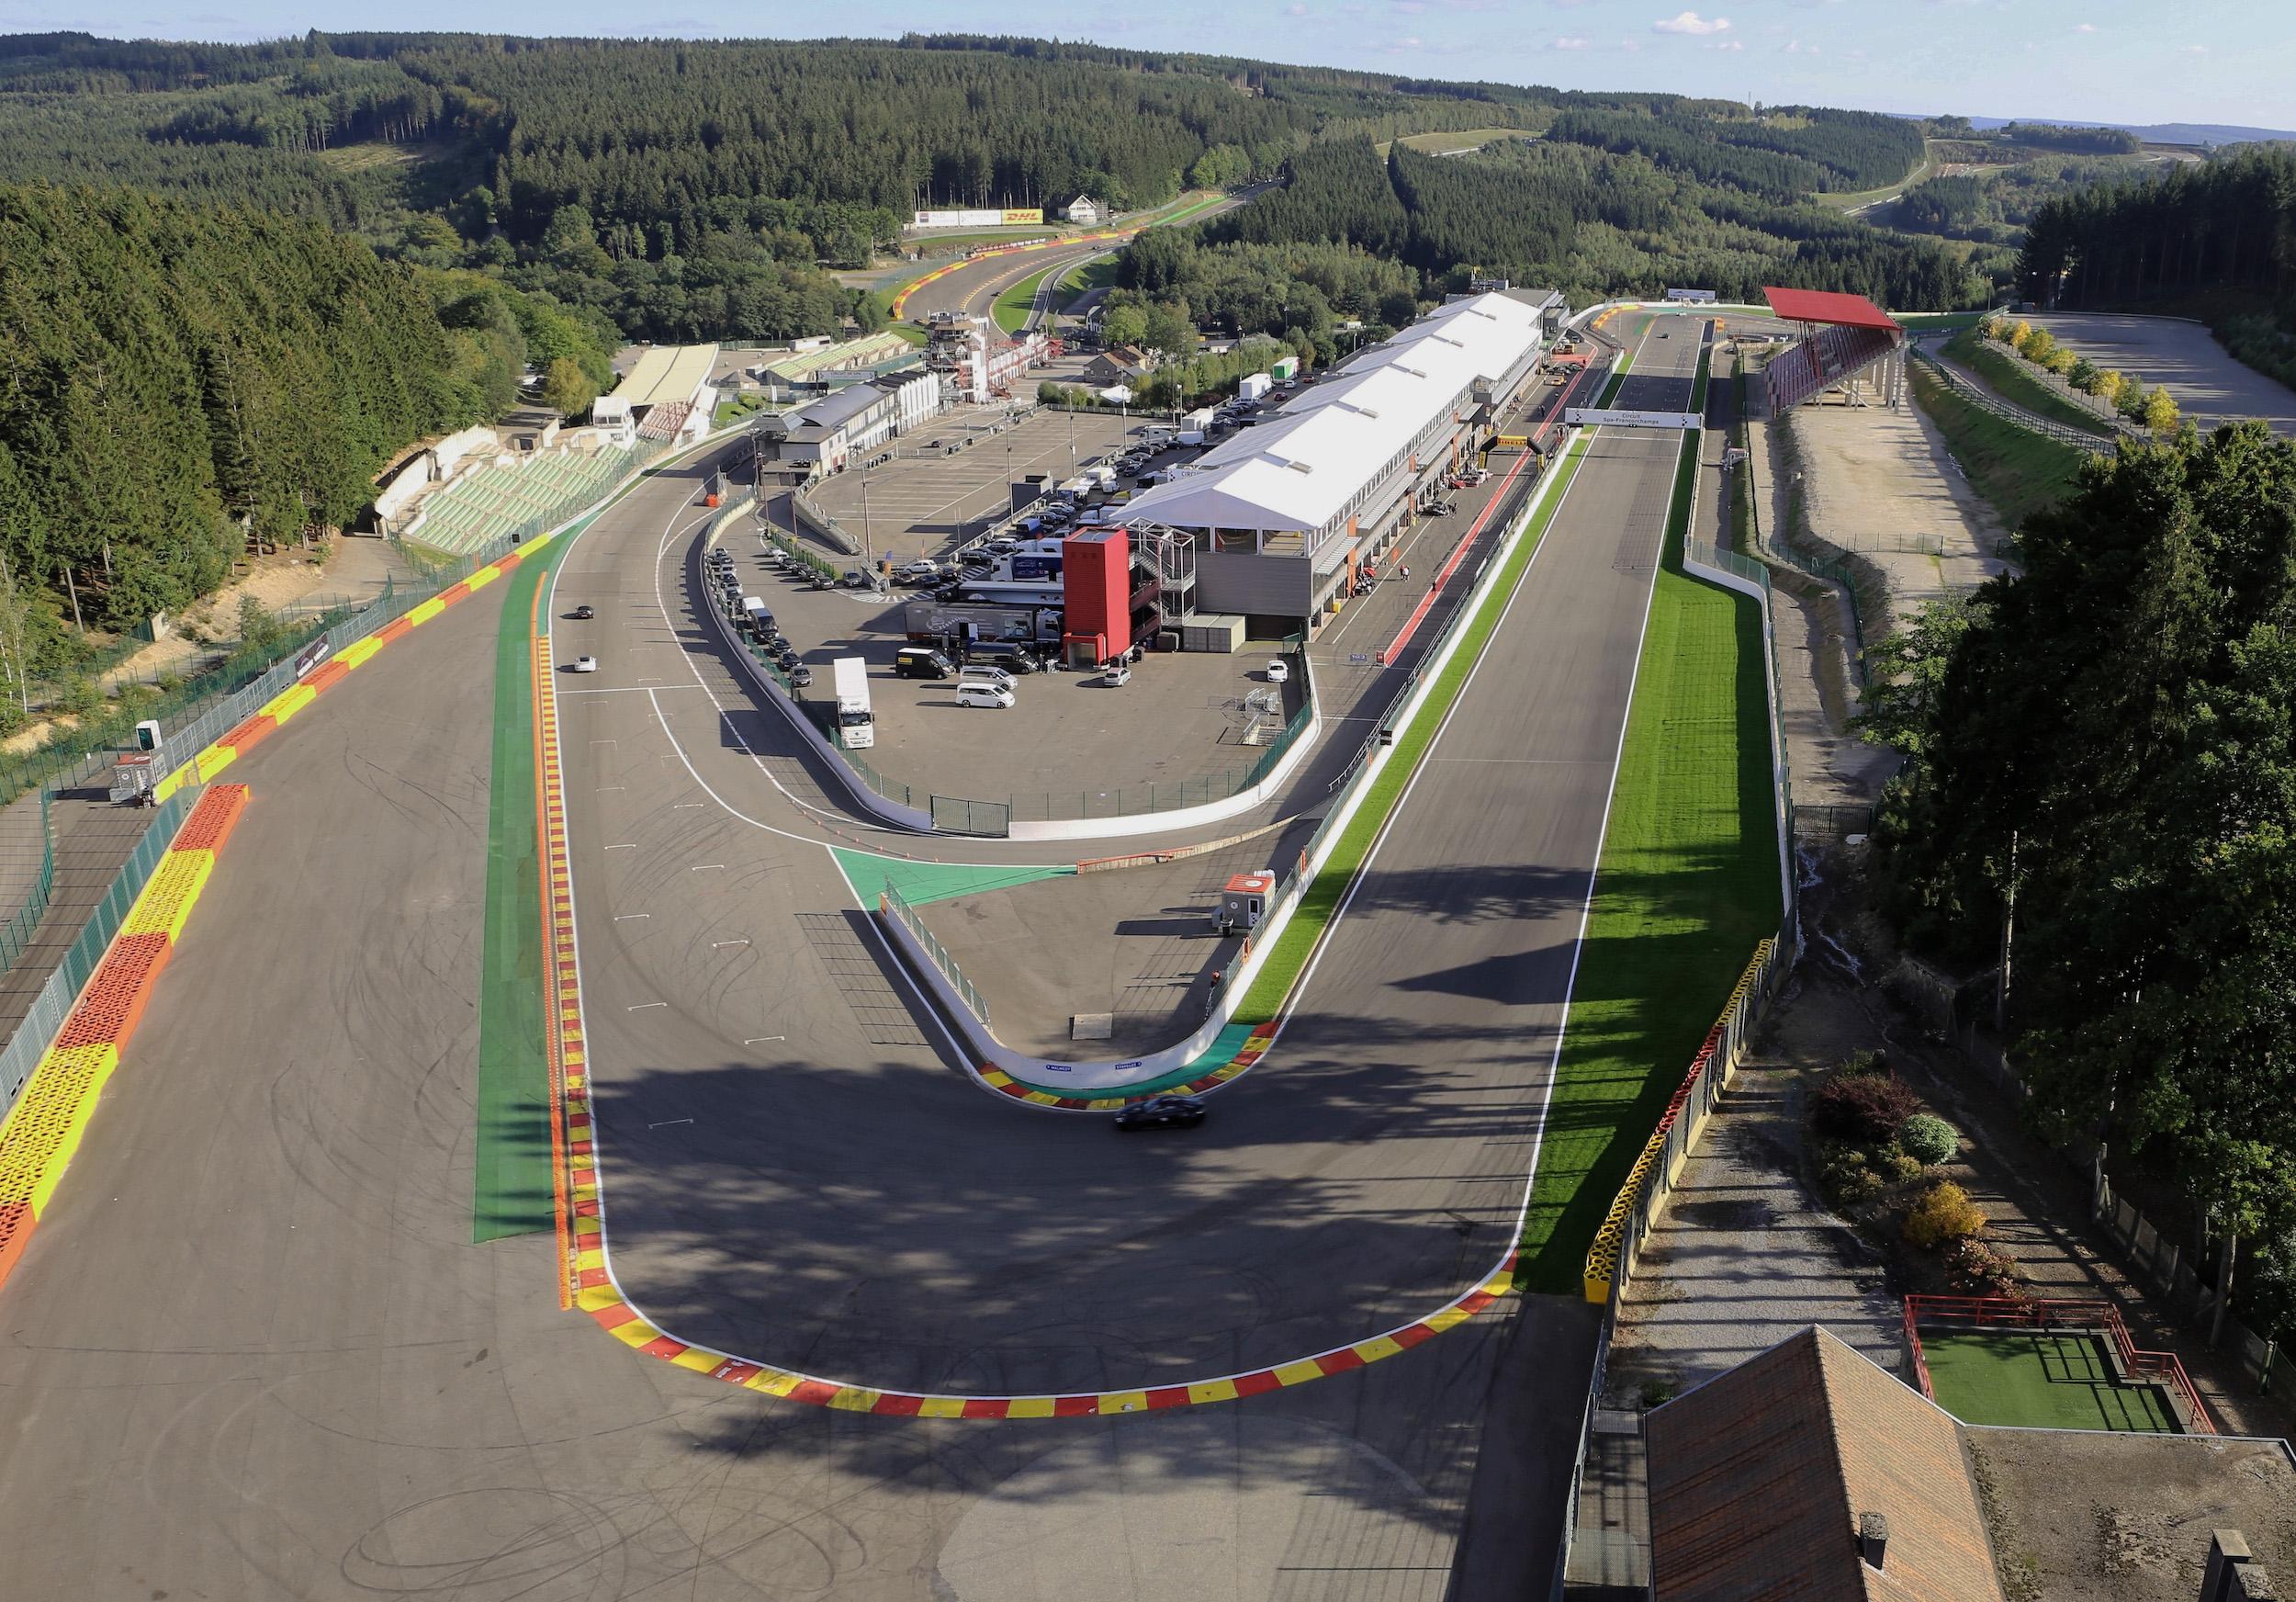 Circuit SPA 7